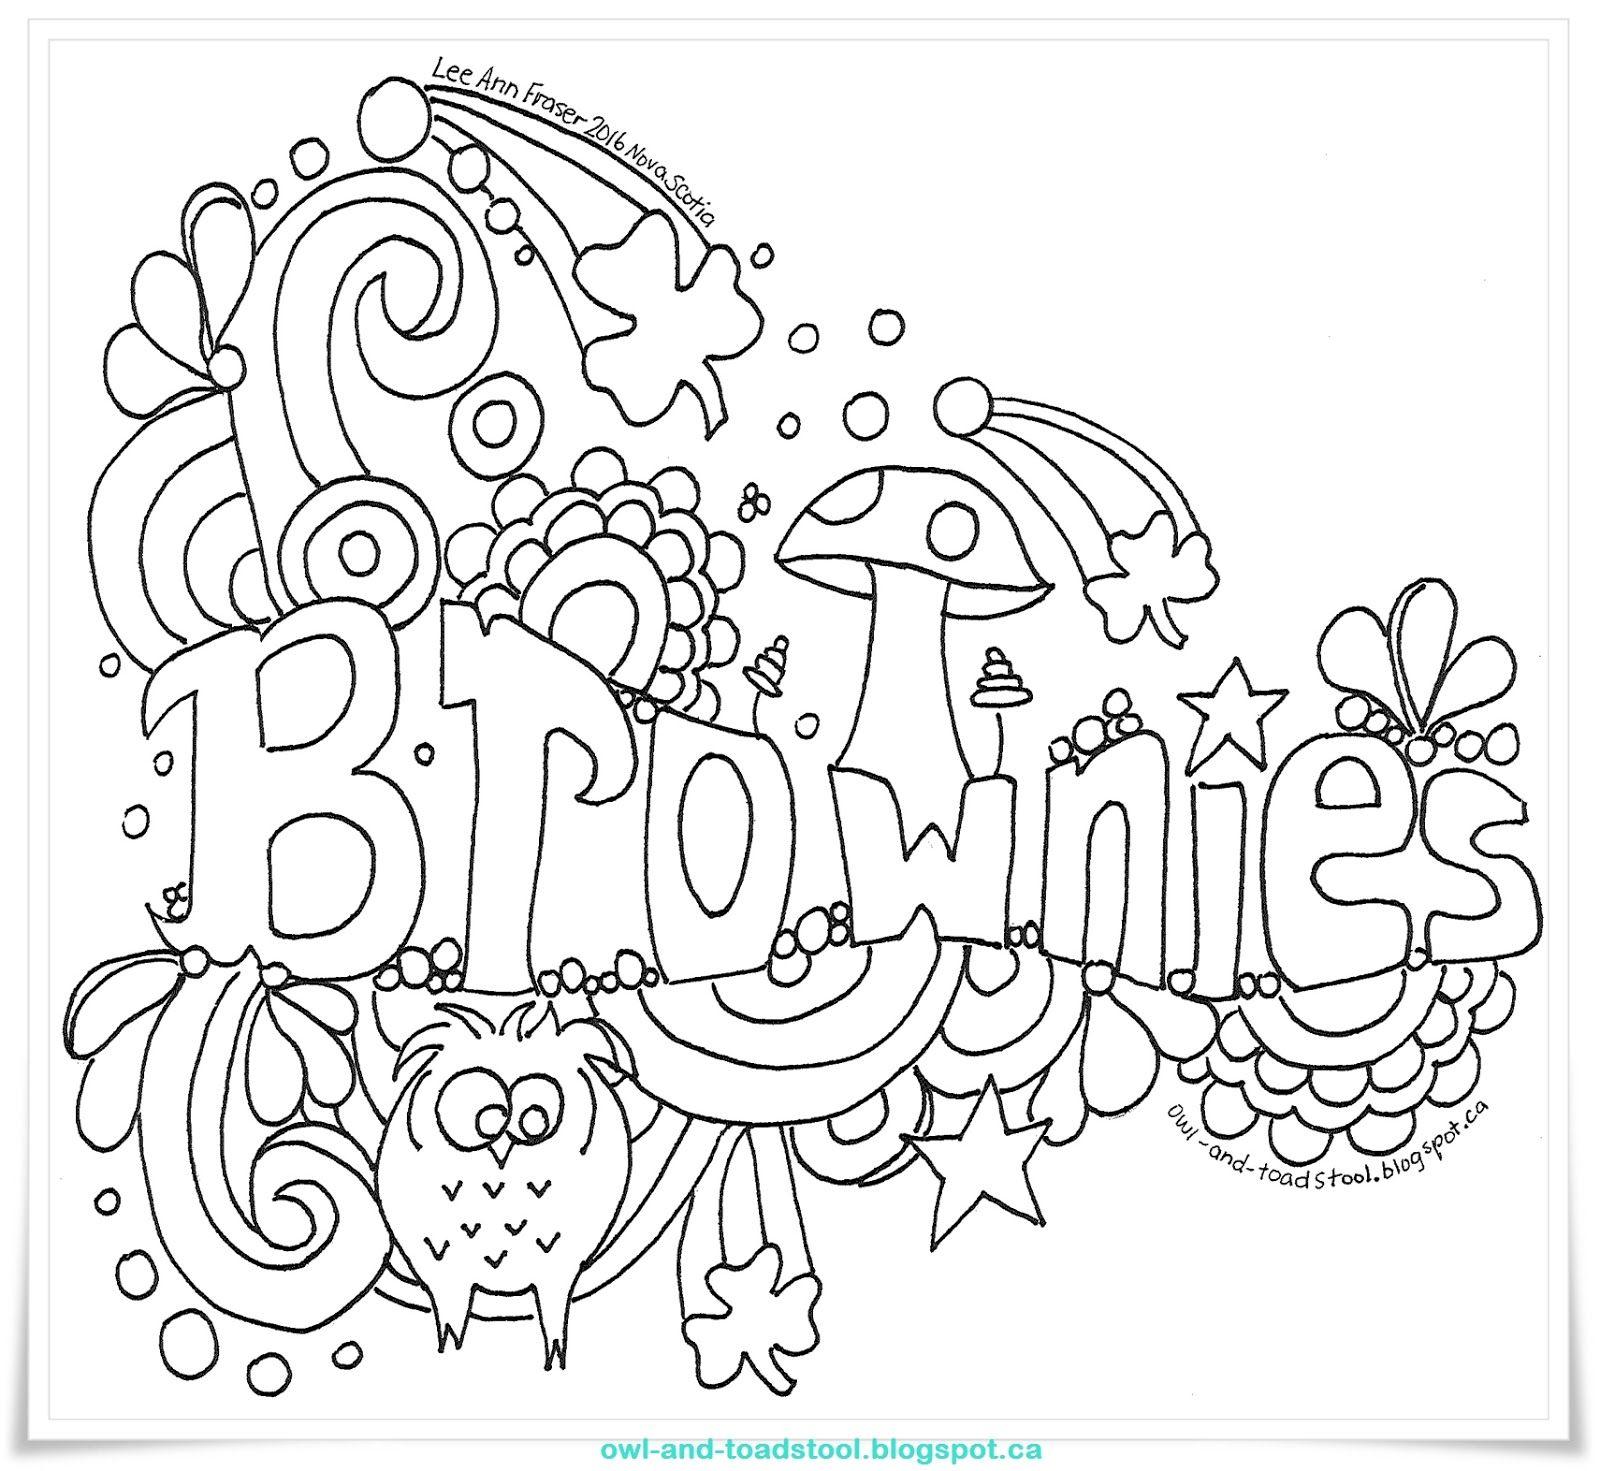 Doodle Brownies